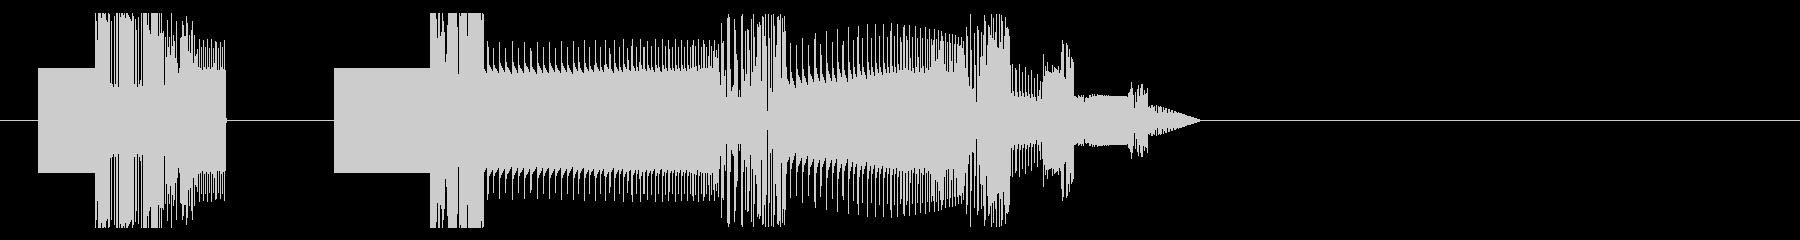 KANT8bit効果音082443の未再生の波形